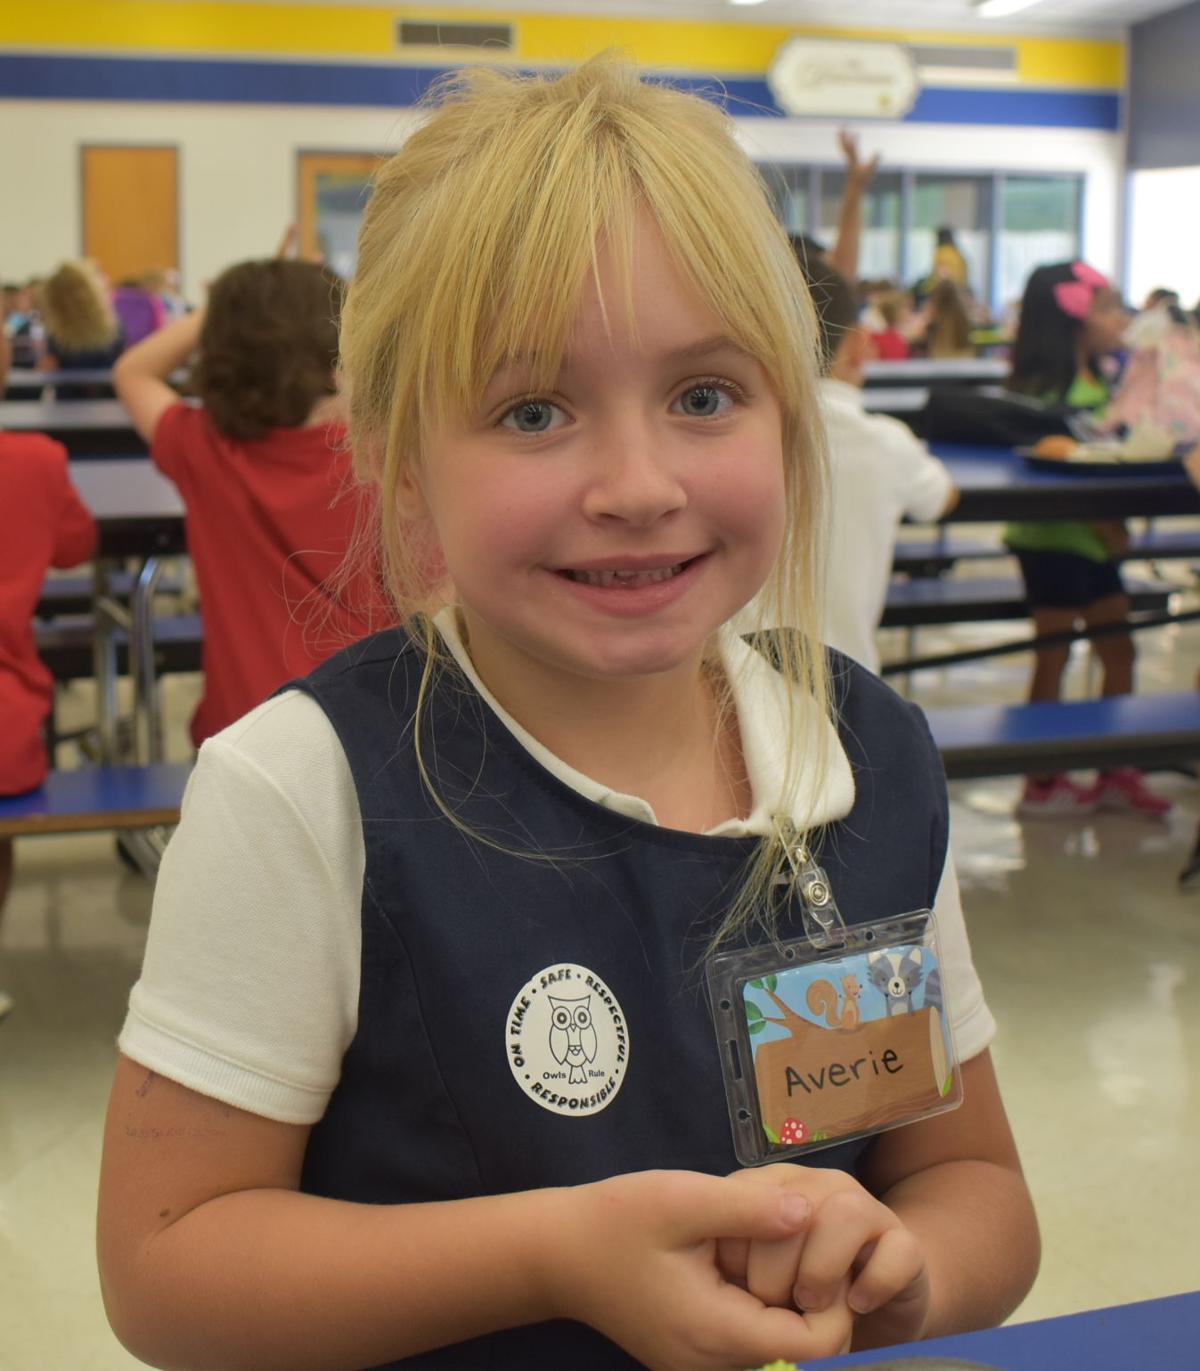 Averie Pennington, 5, Sahuarita Primary School